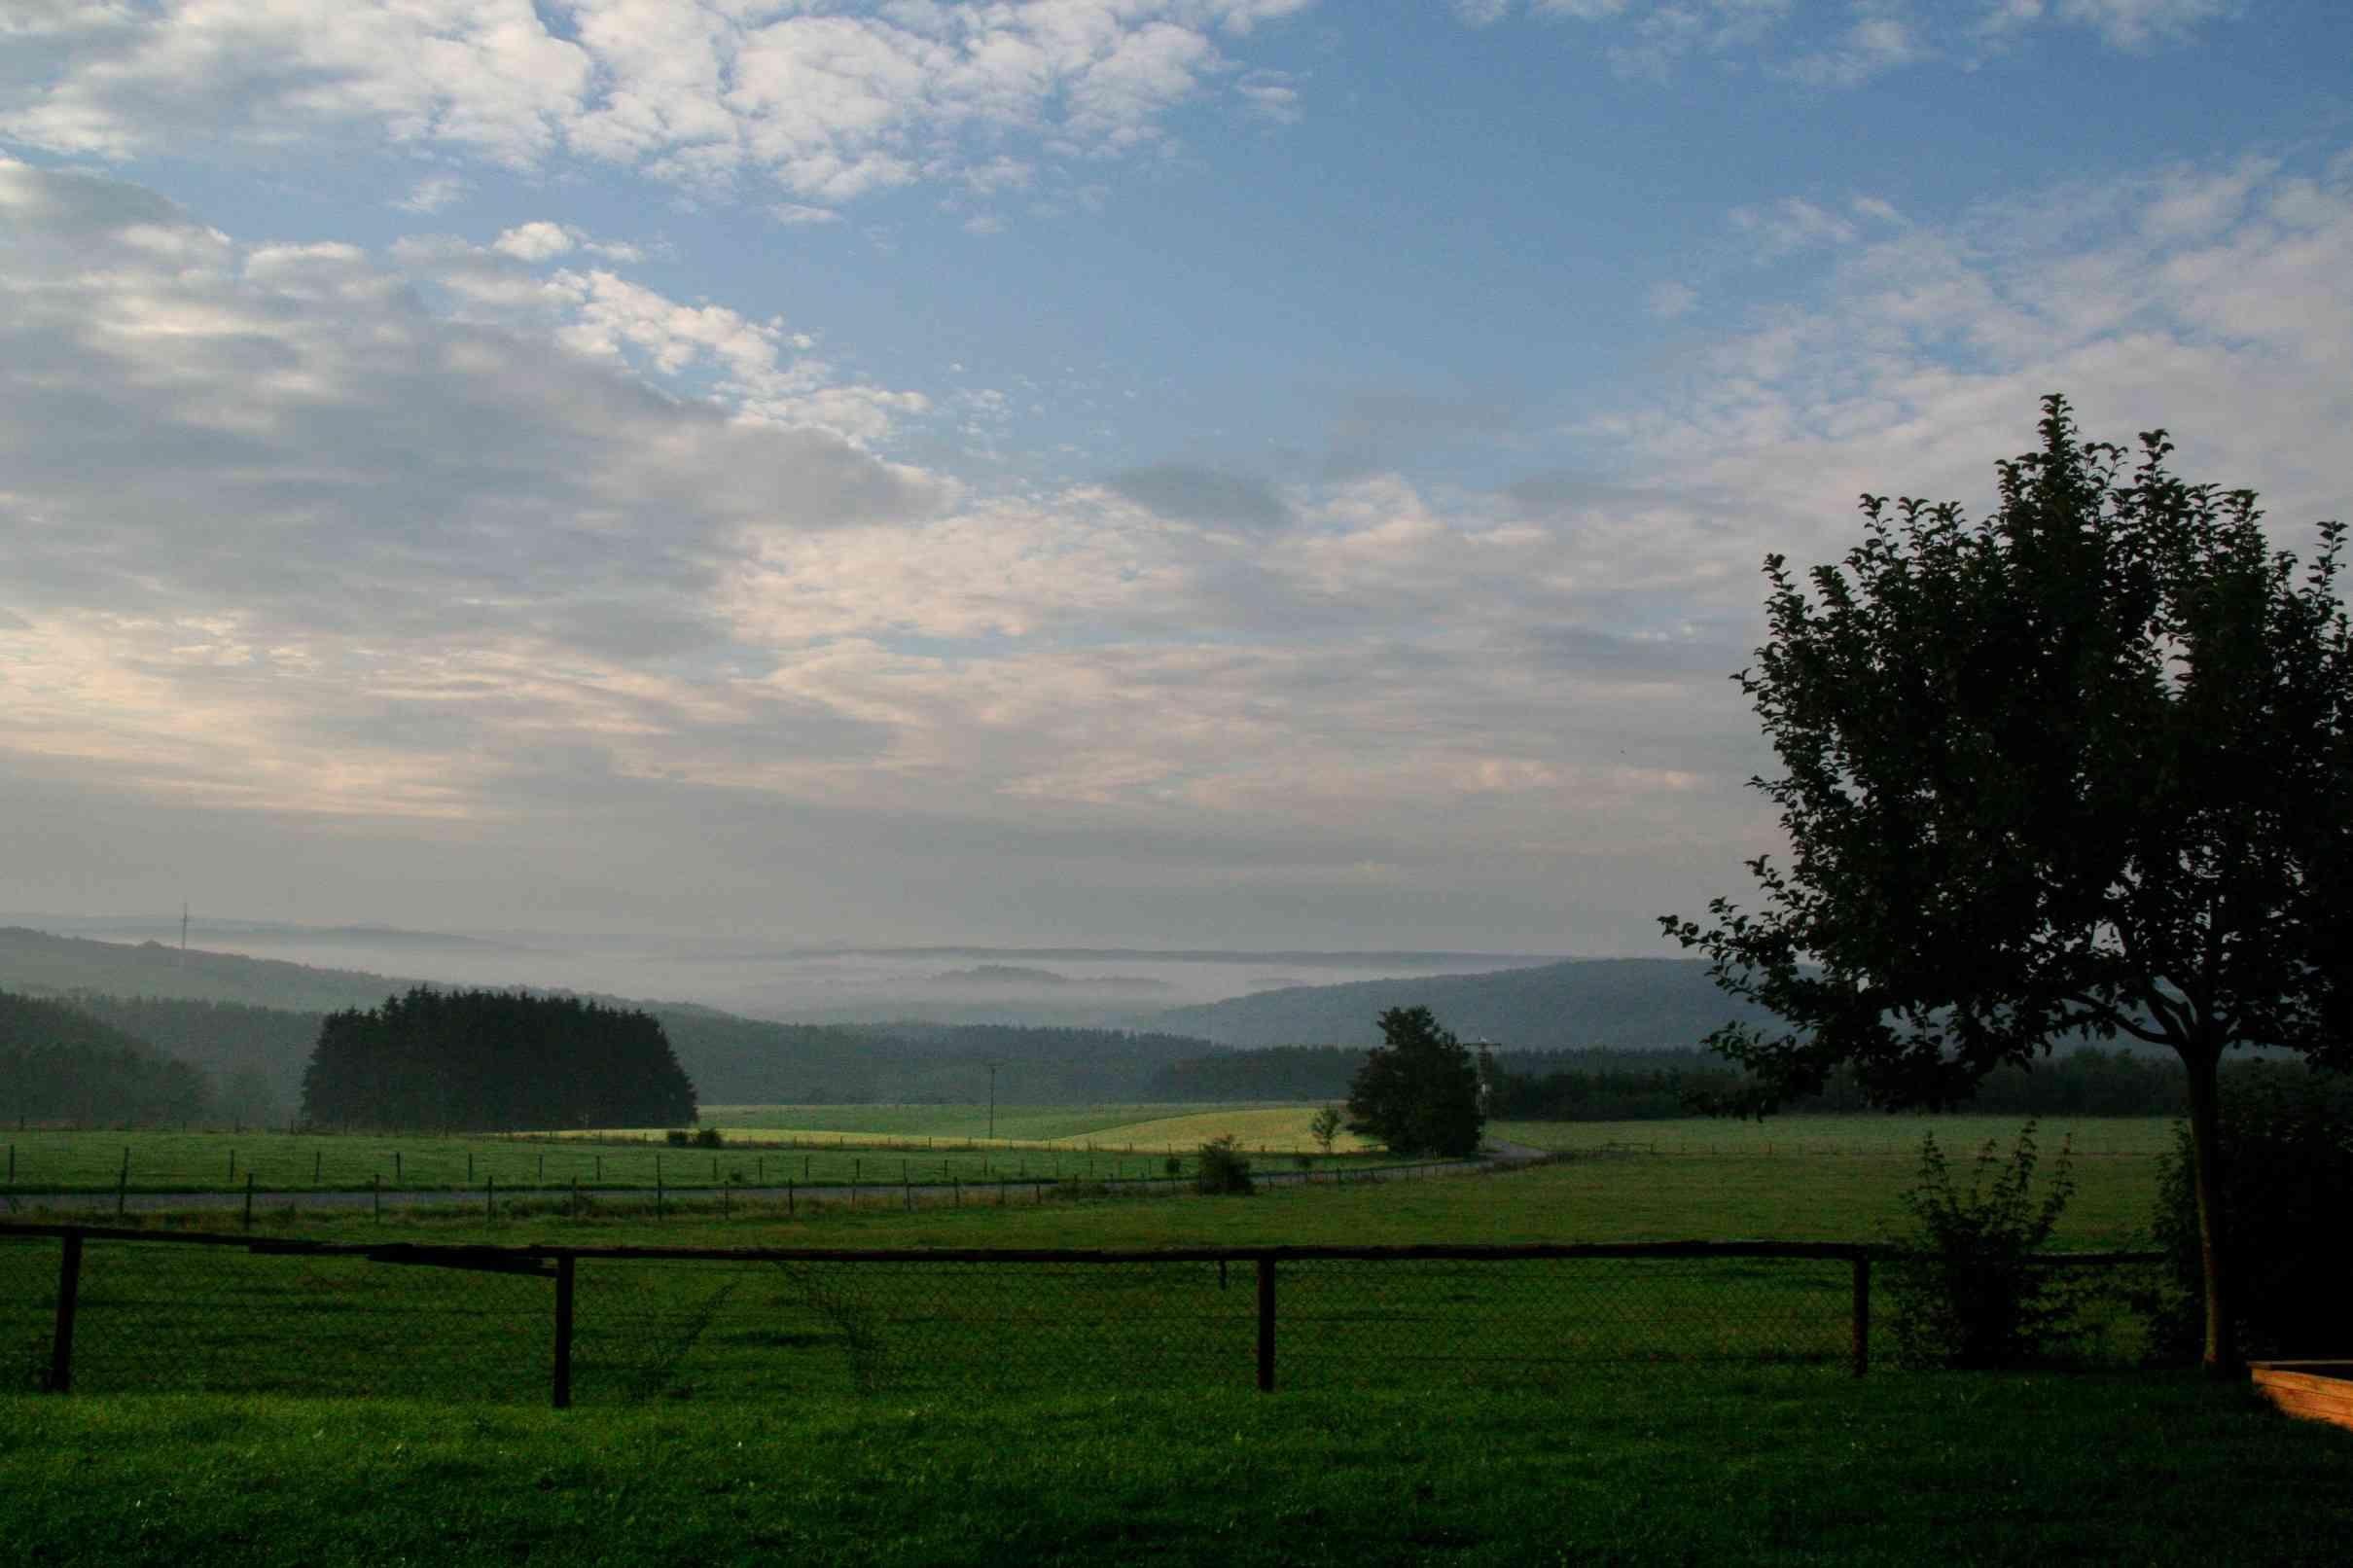 Blankenheim Freilingen in der Region Eifel